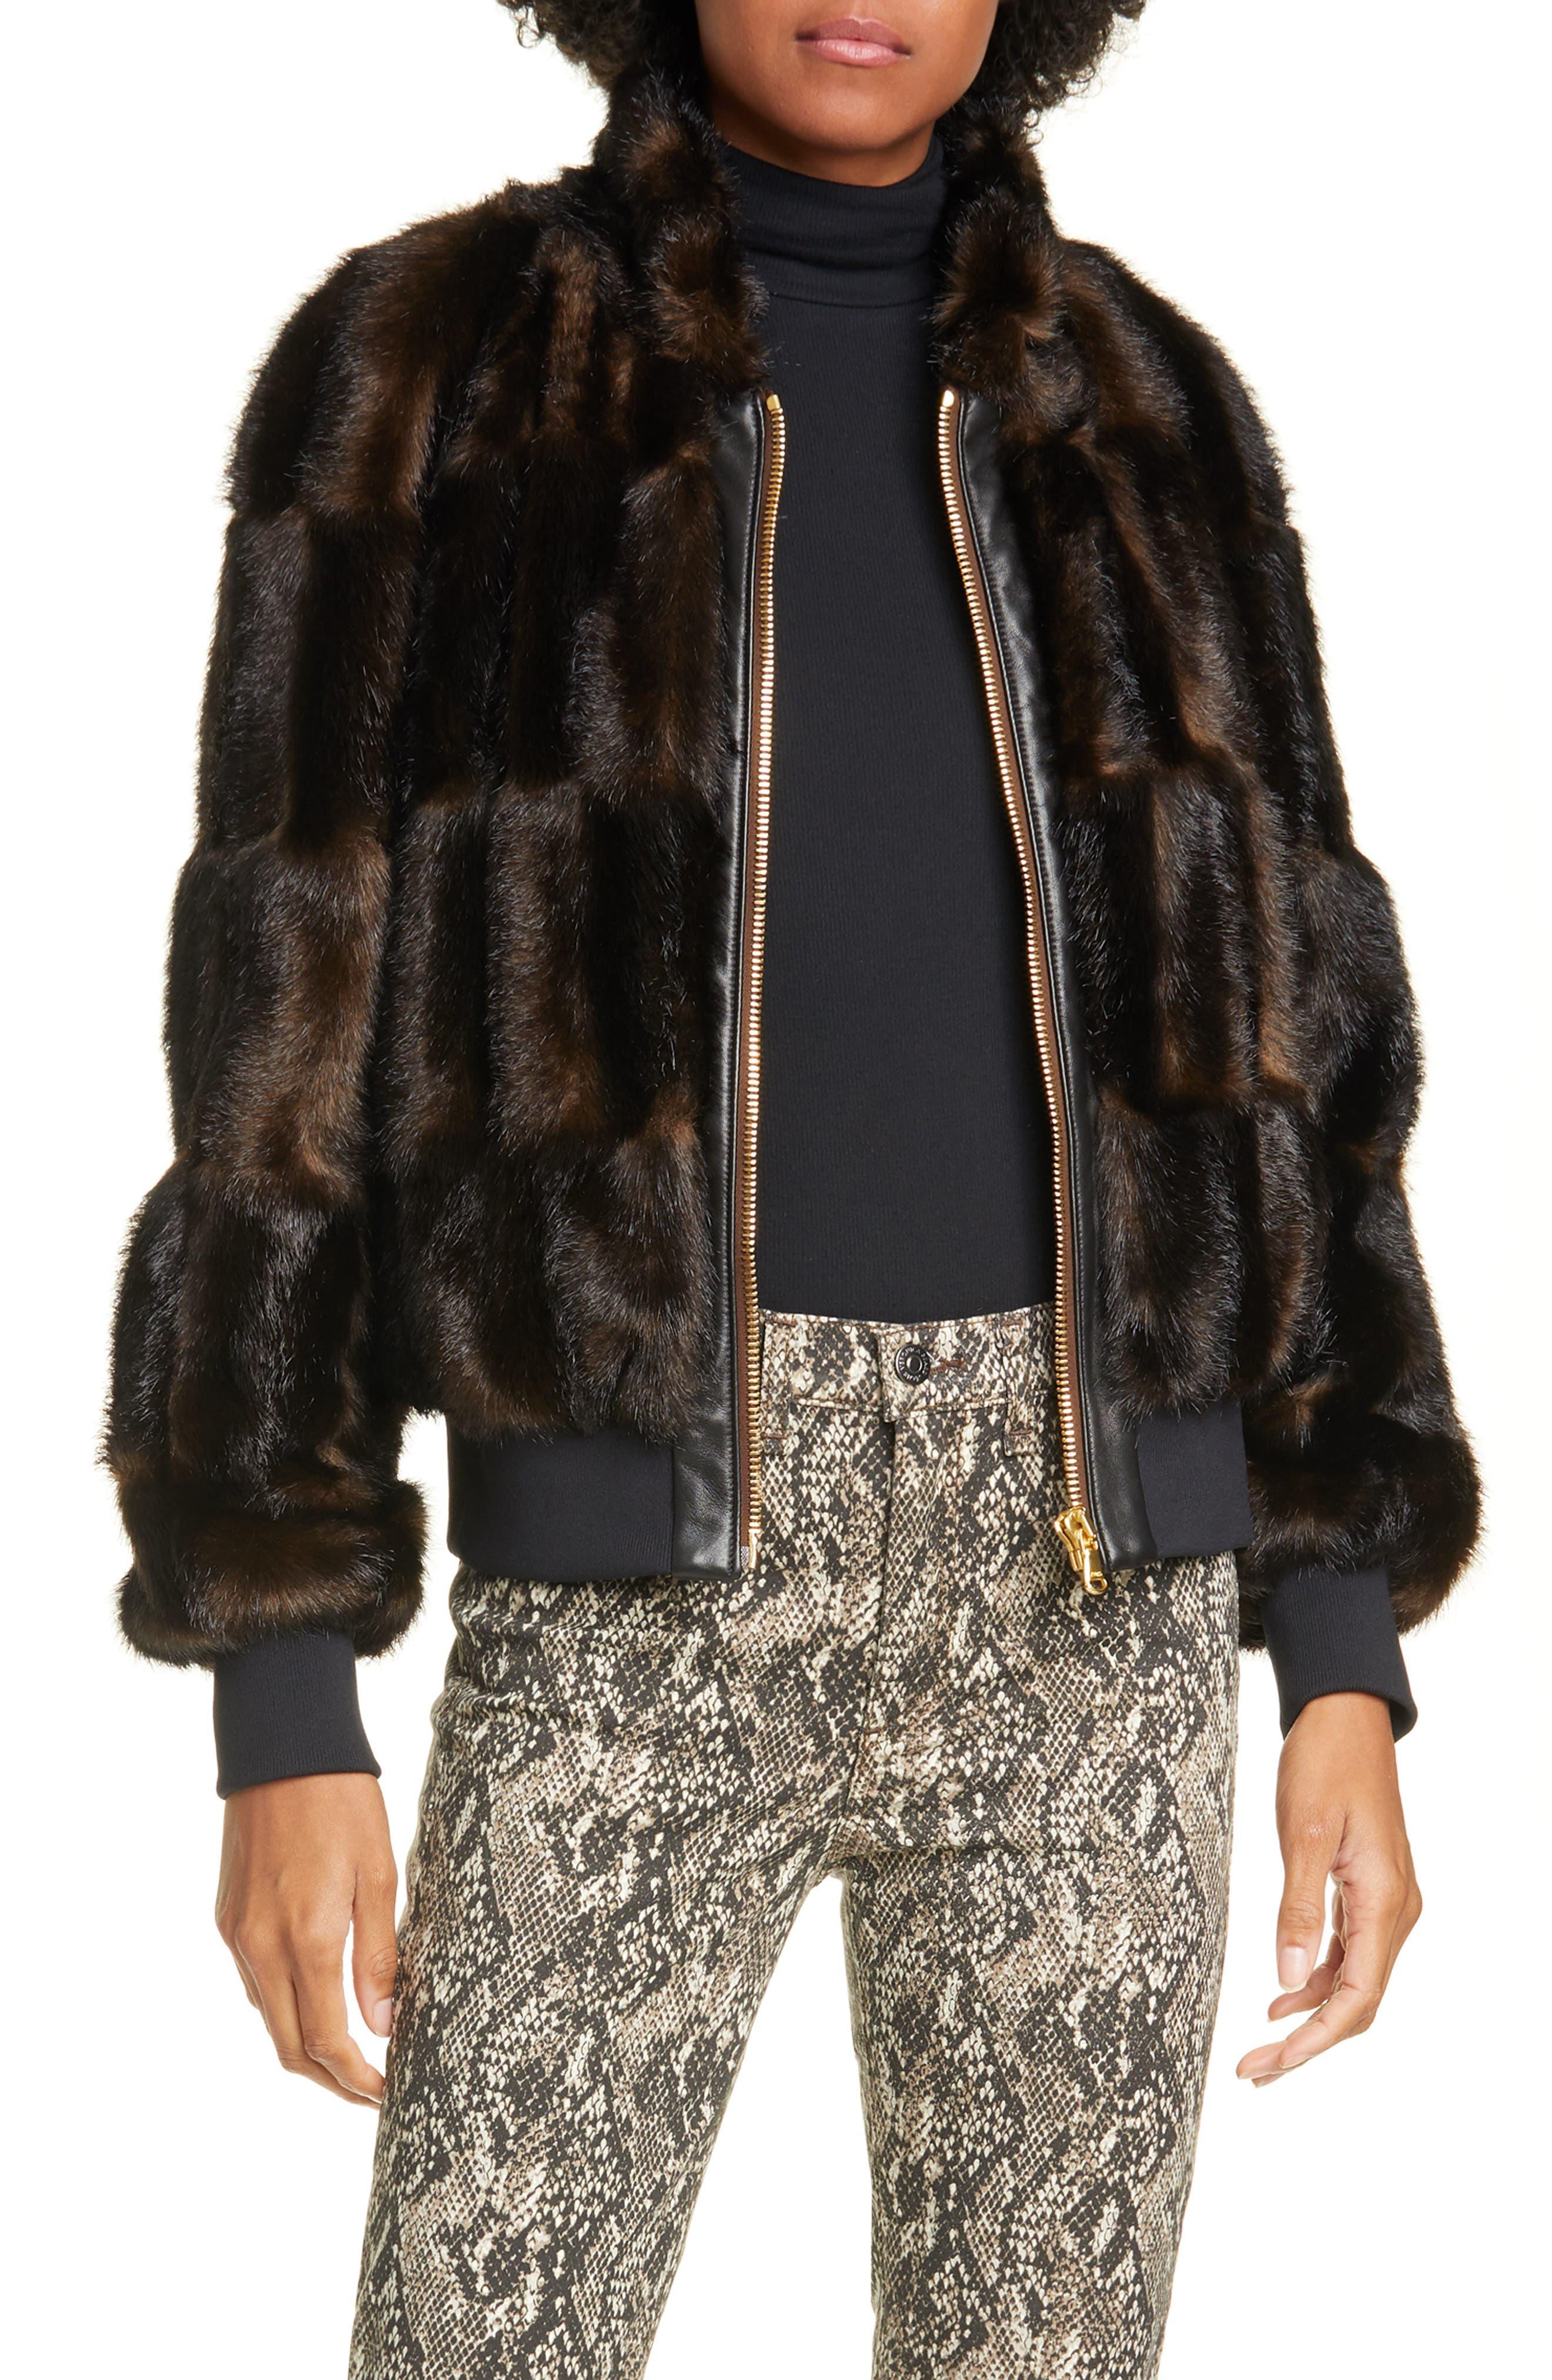 Veronica Beard Furs Bellfire Faux Fur Bomber Jacket